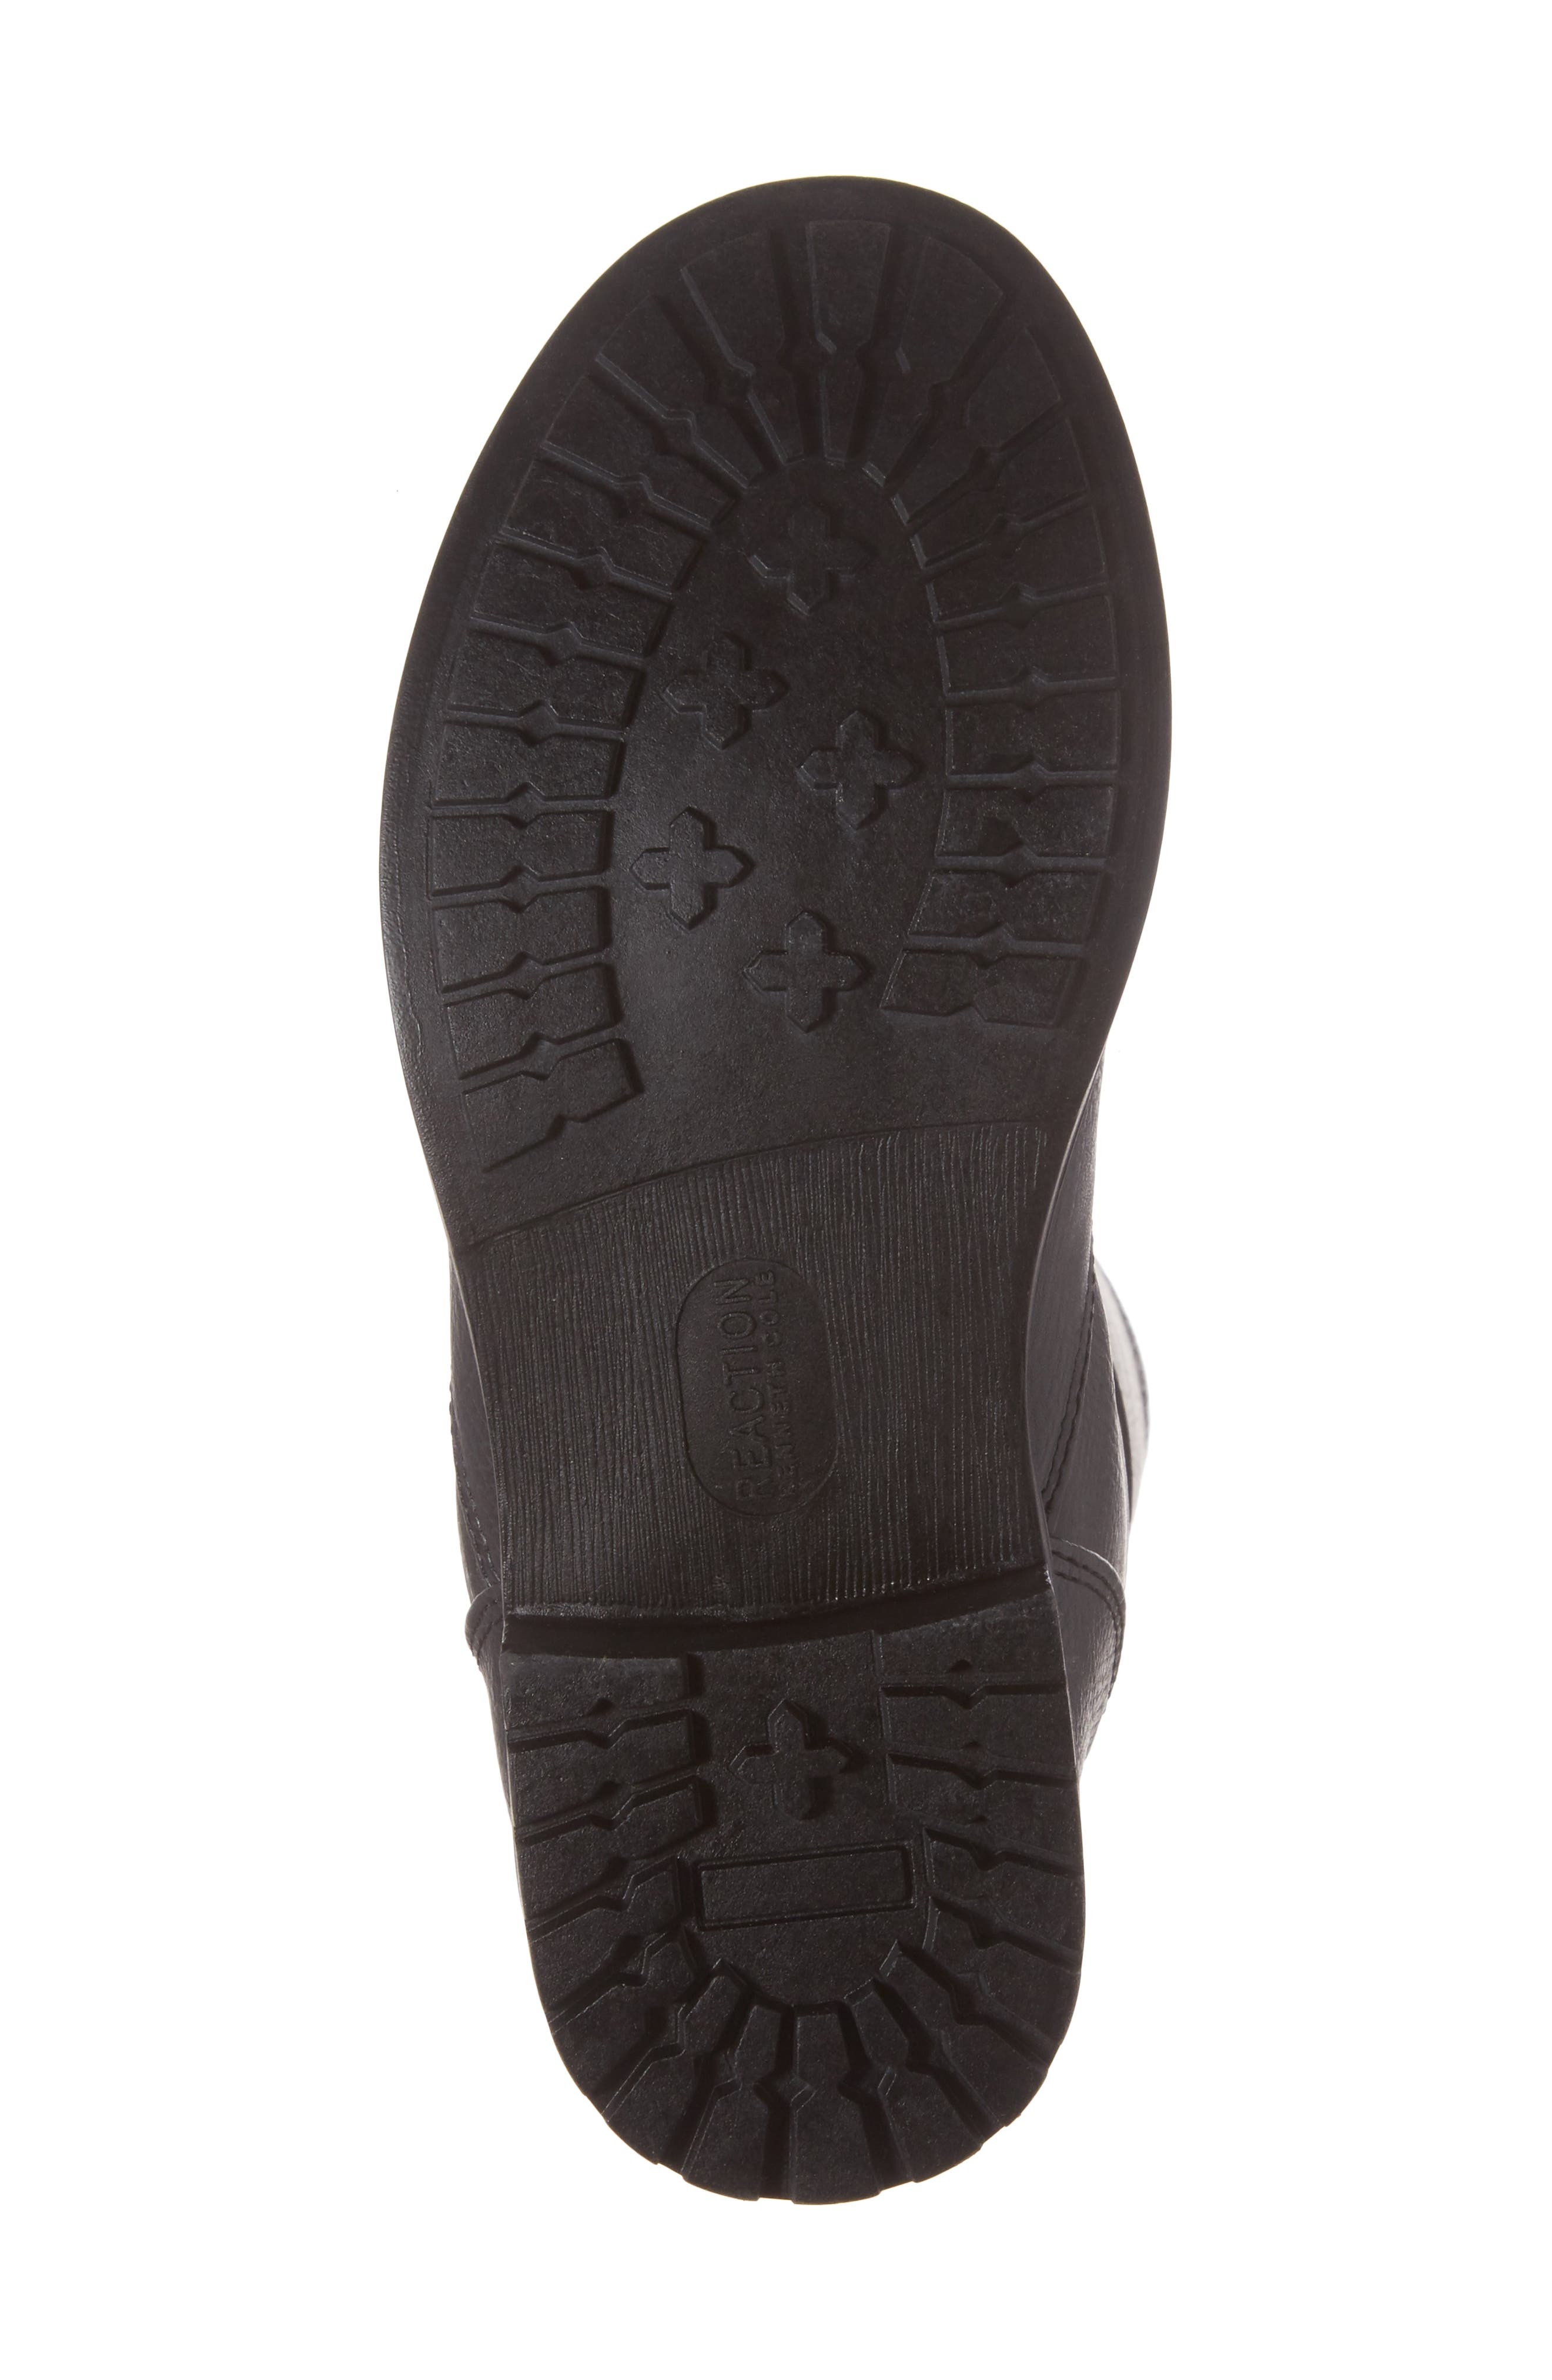 Autumn Stretch Boot,                             Alternate thumbnail 6, color,                             Black Faux Leather